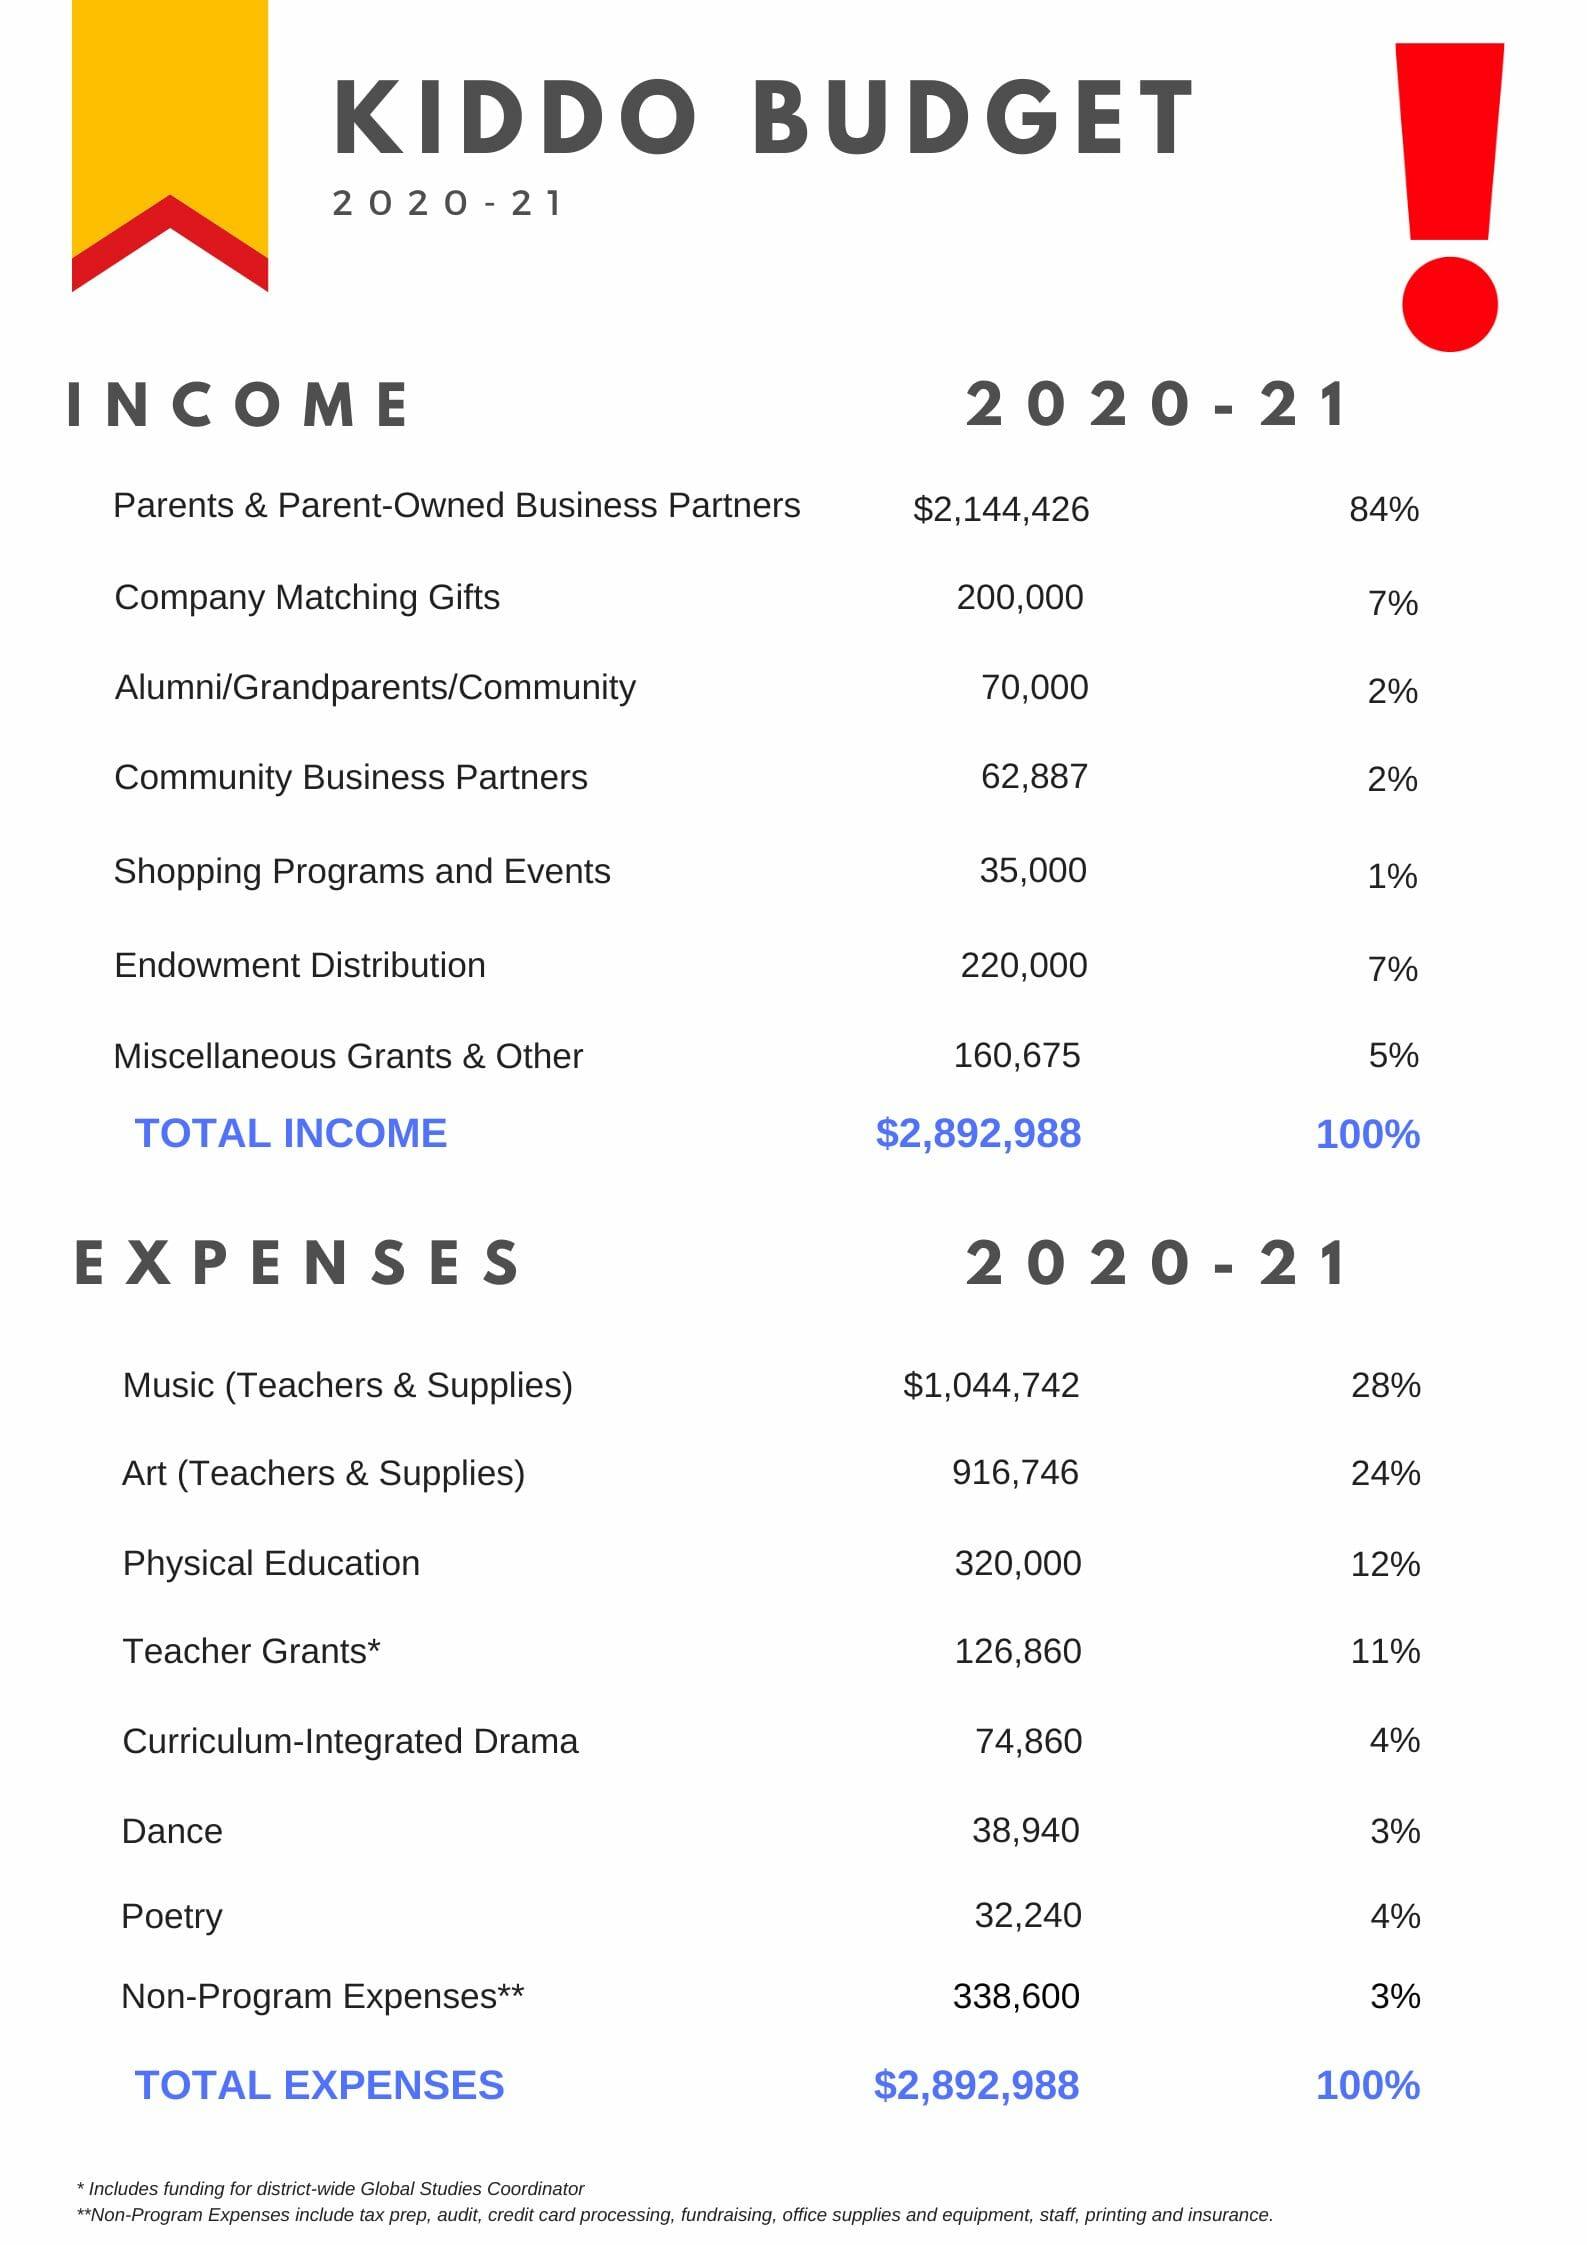 Kiddo Budget 2020-21